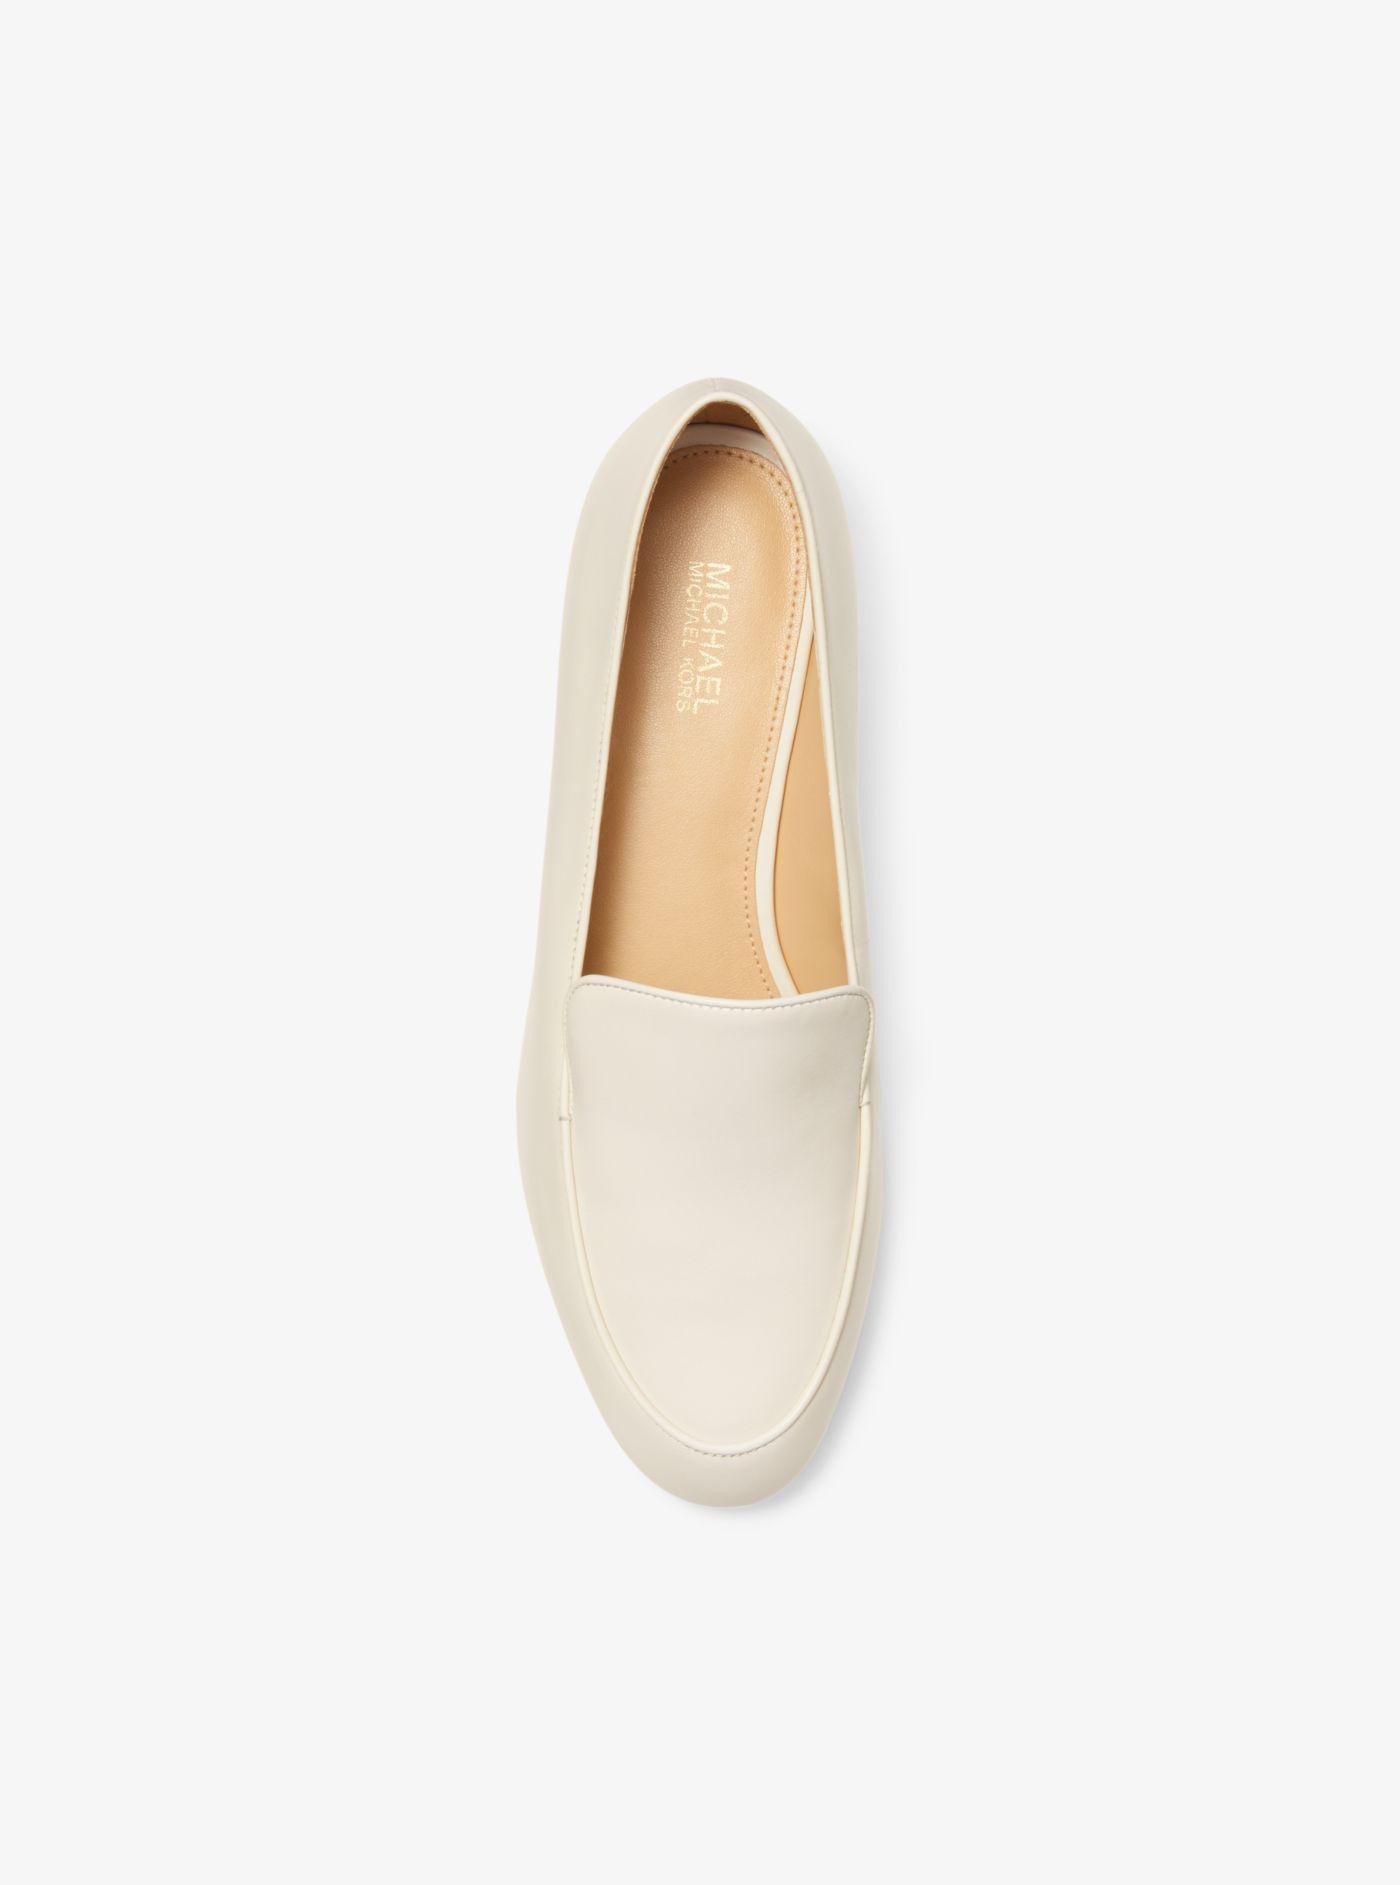 Michael Kors Valerie Leather Loafer - Lyst